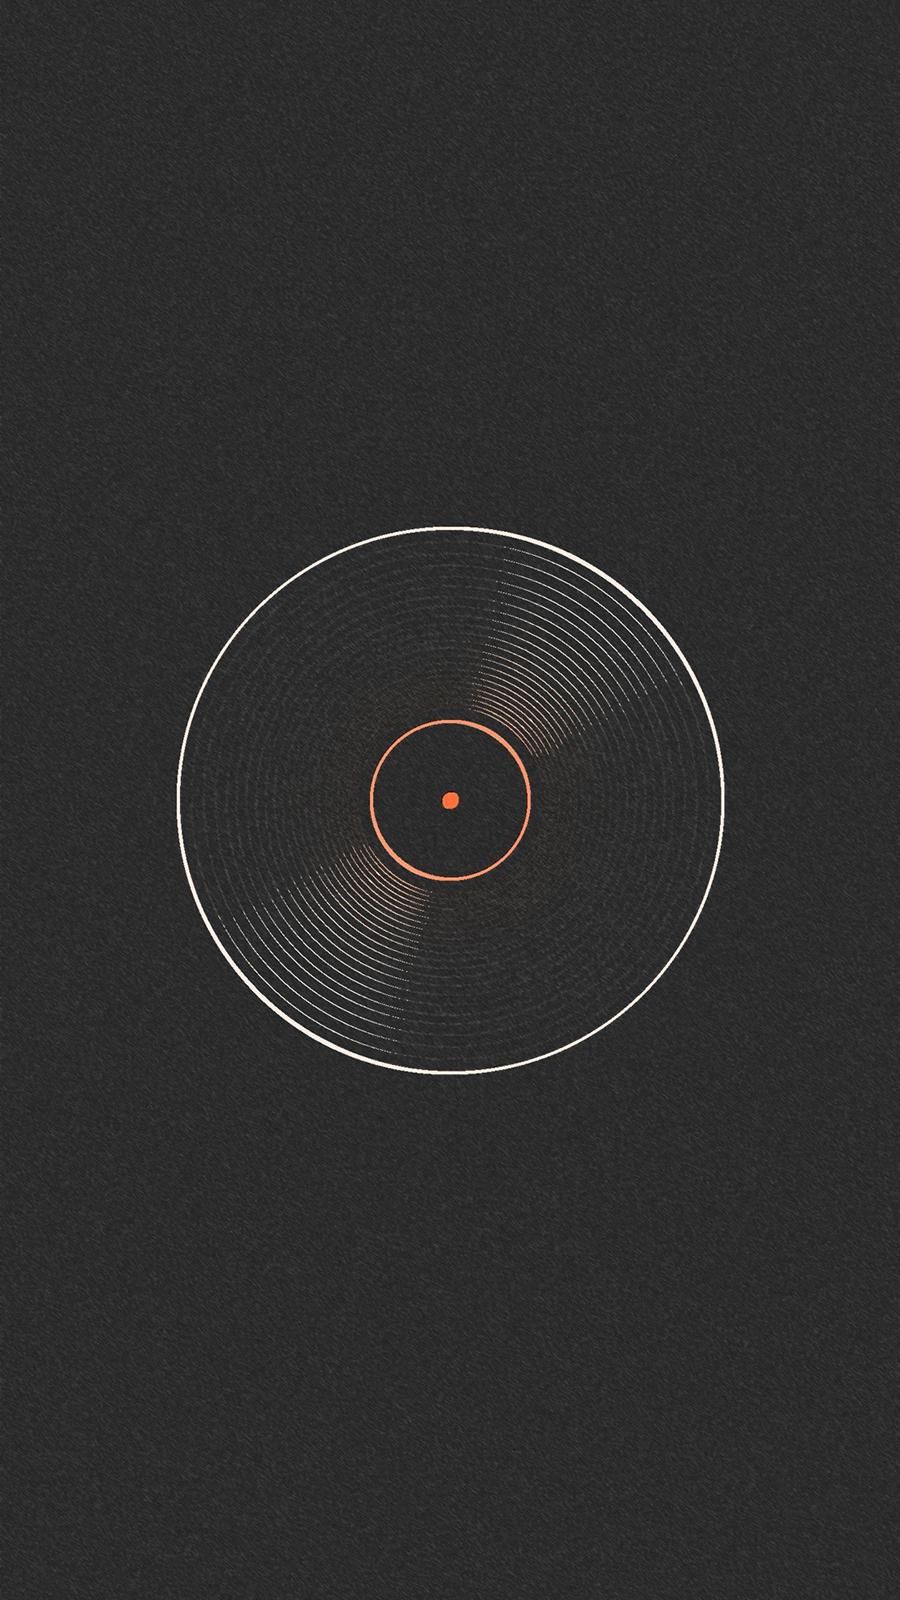 Black Cool DJ Record Wallpapers Free Download